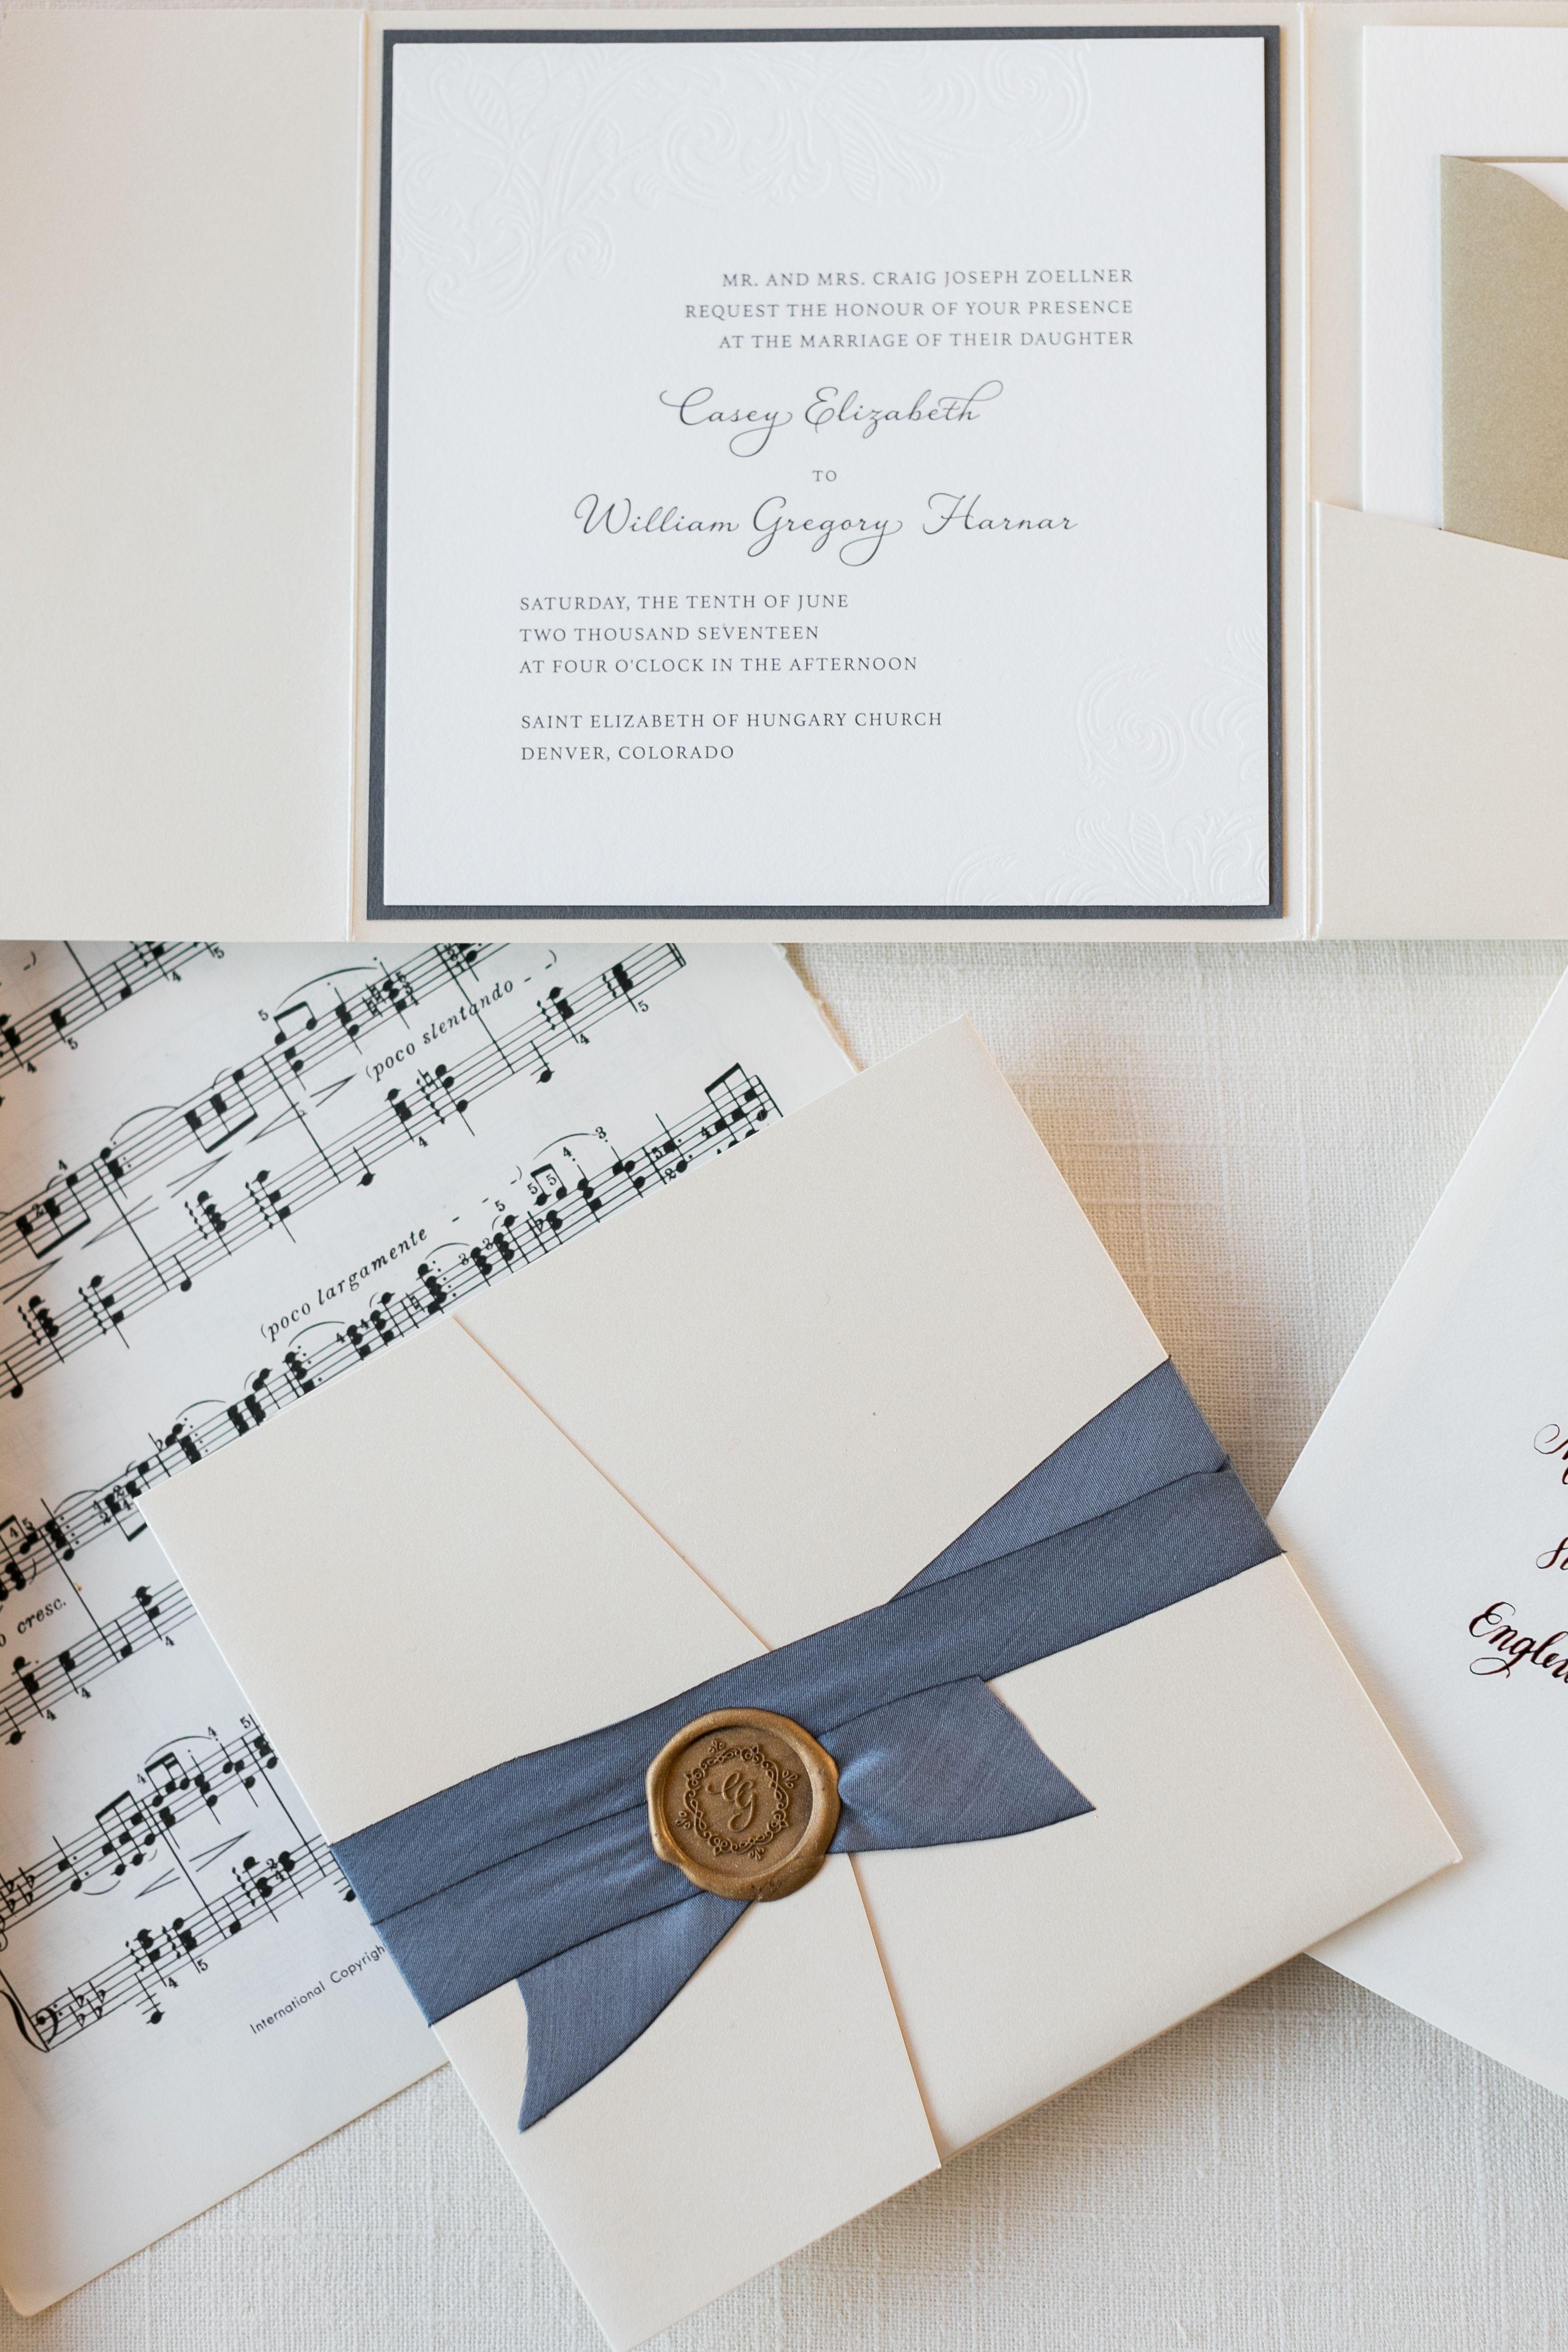 Pocket Wedding Invitation With Hand Dyed Silk Ribbon Gold